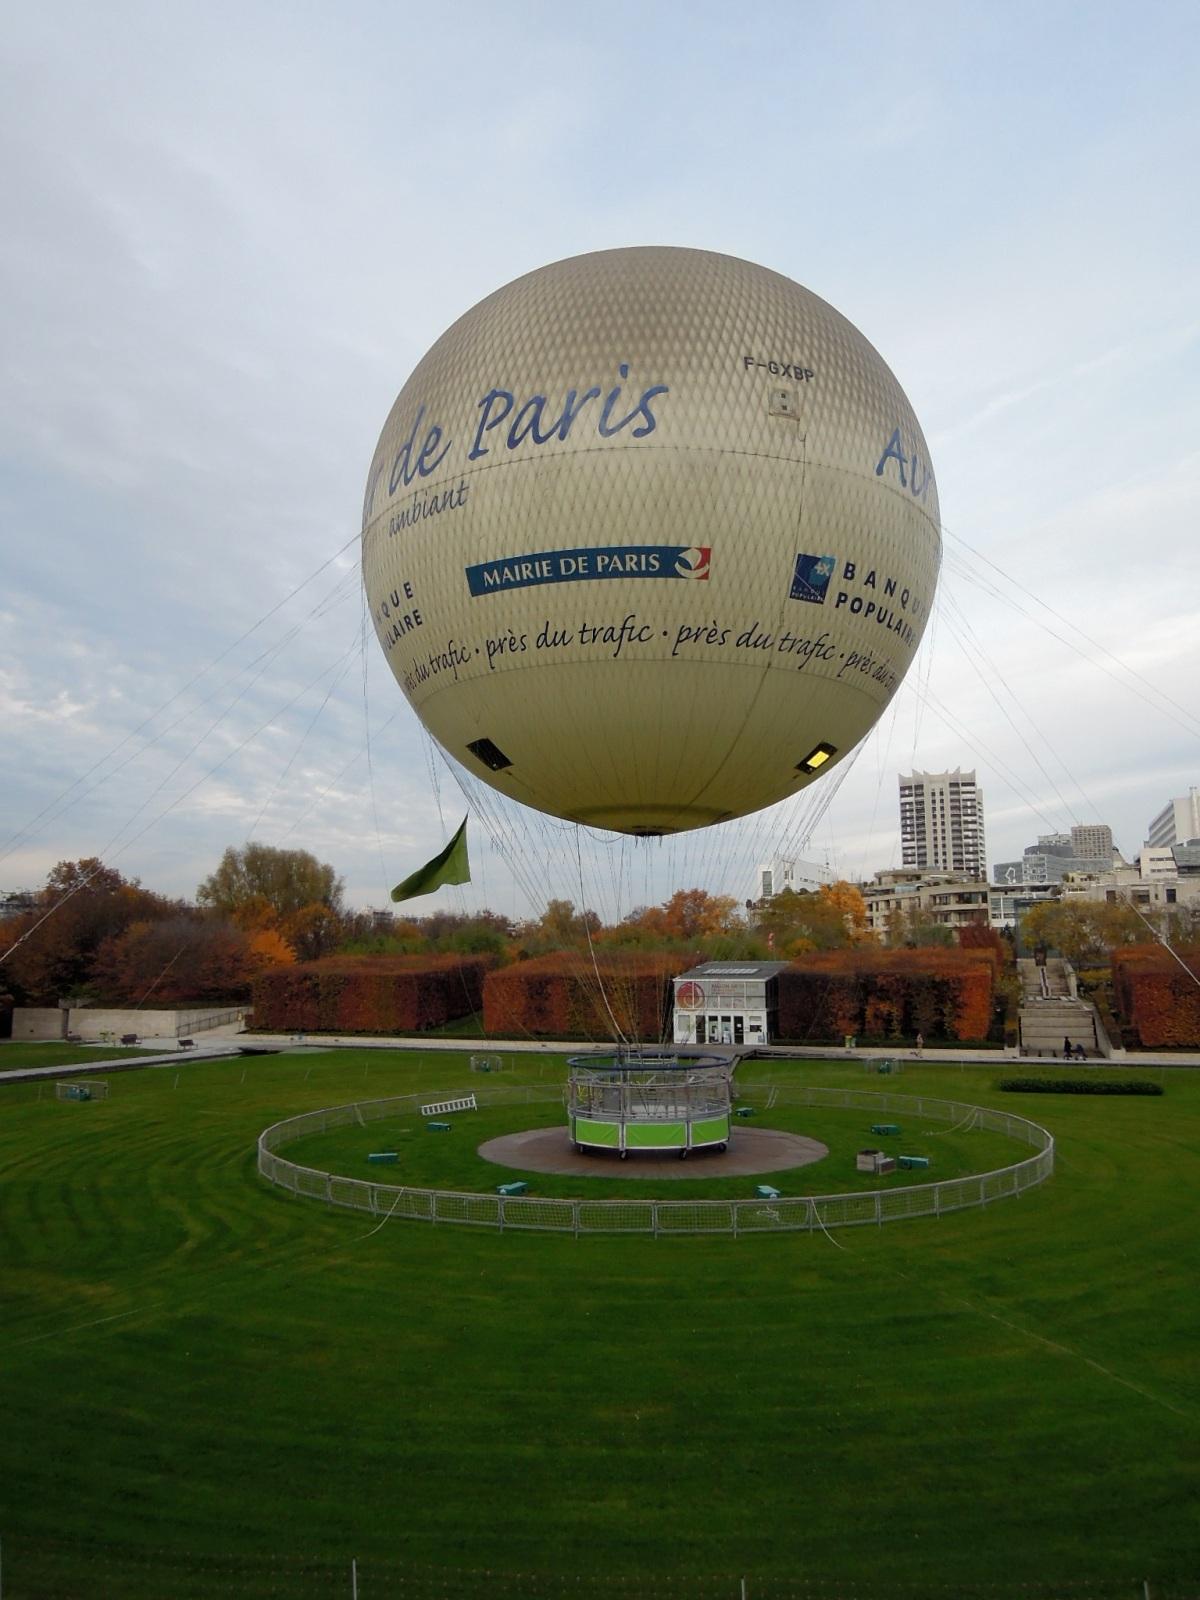 Big balloon over the grass